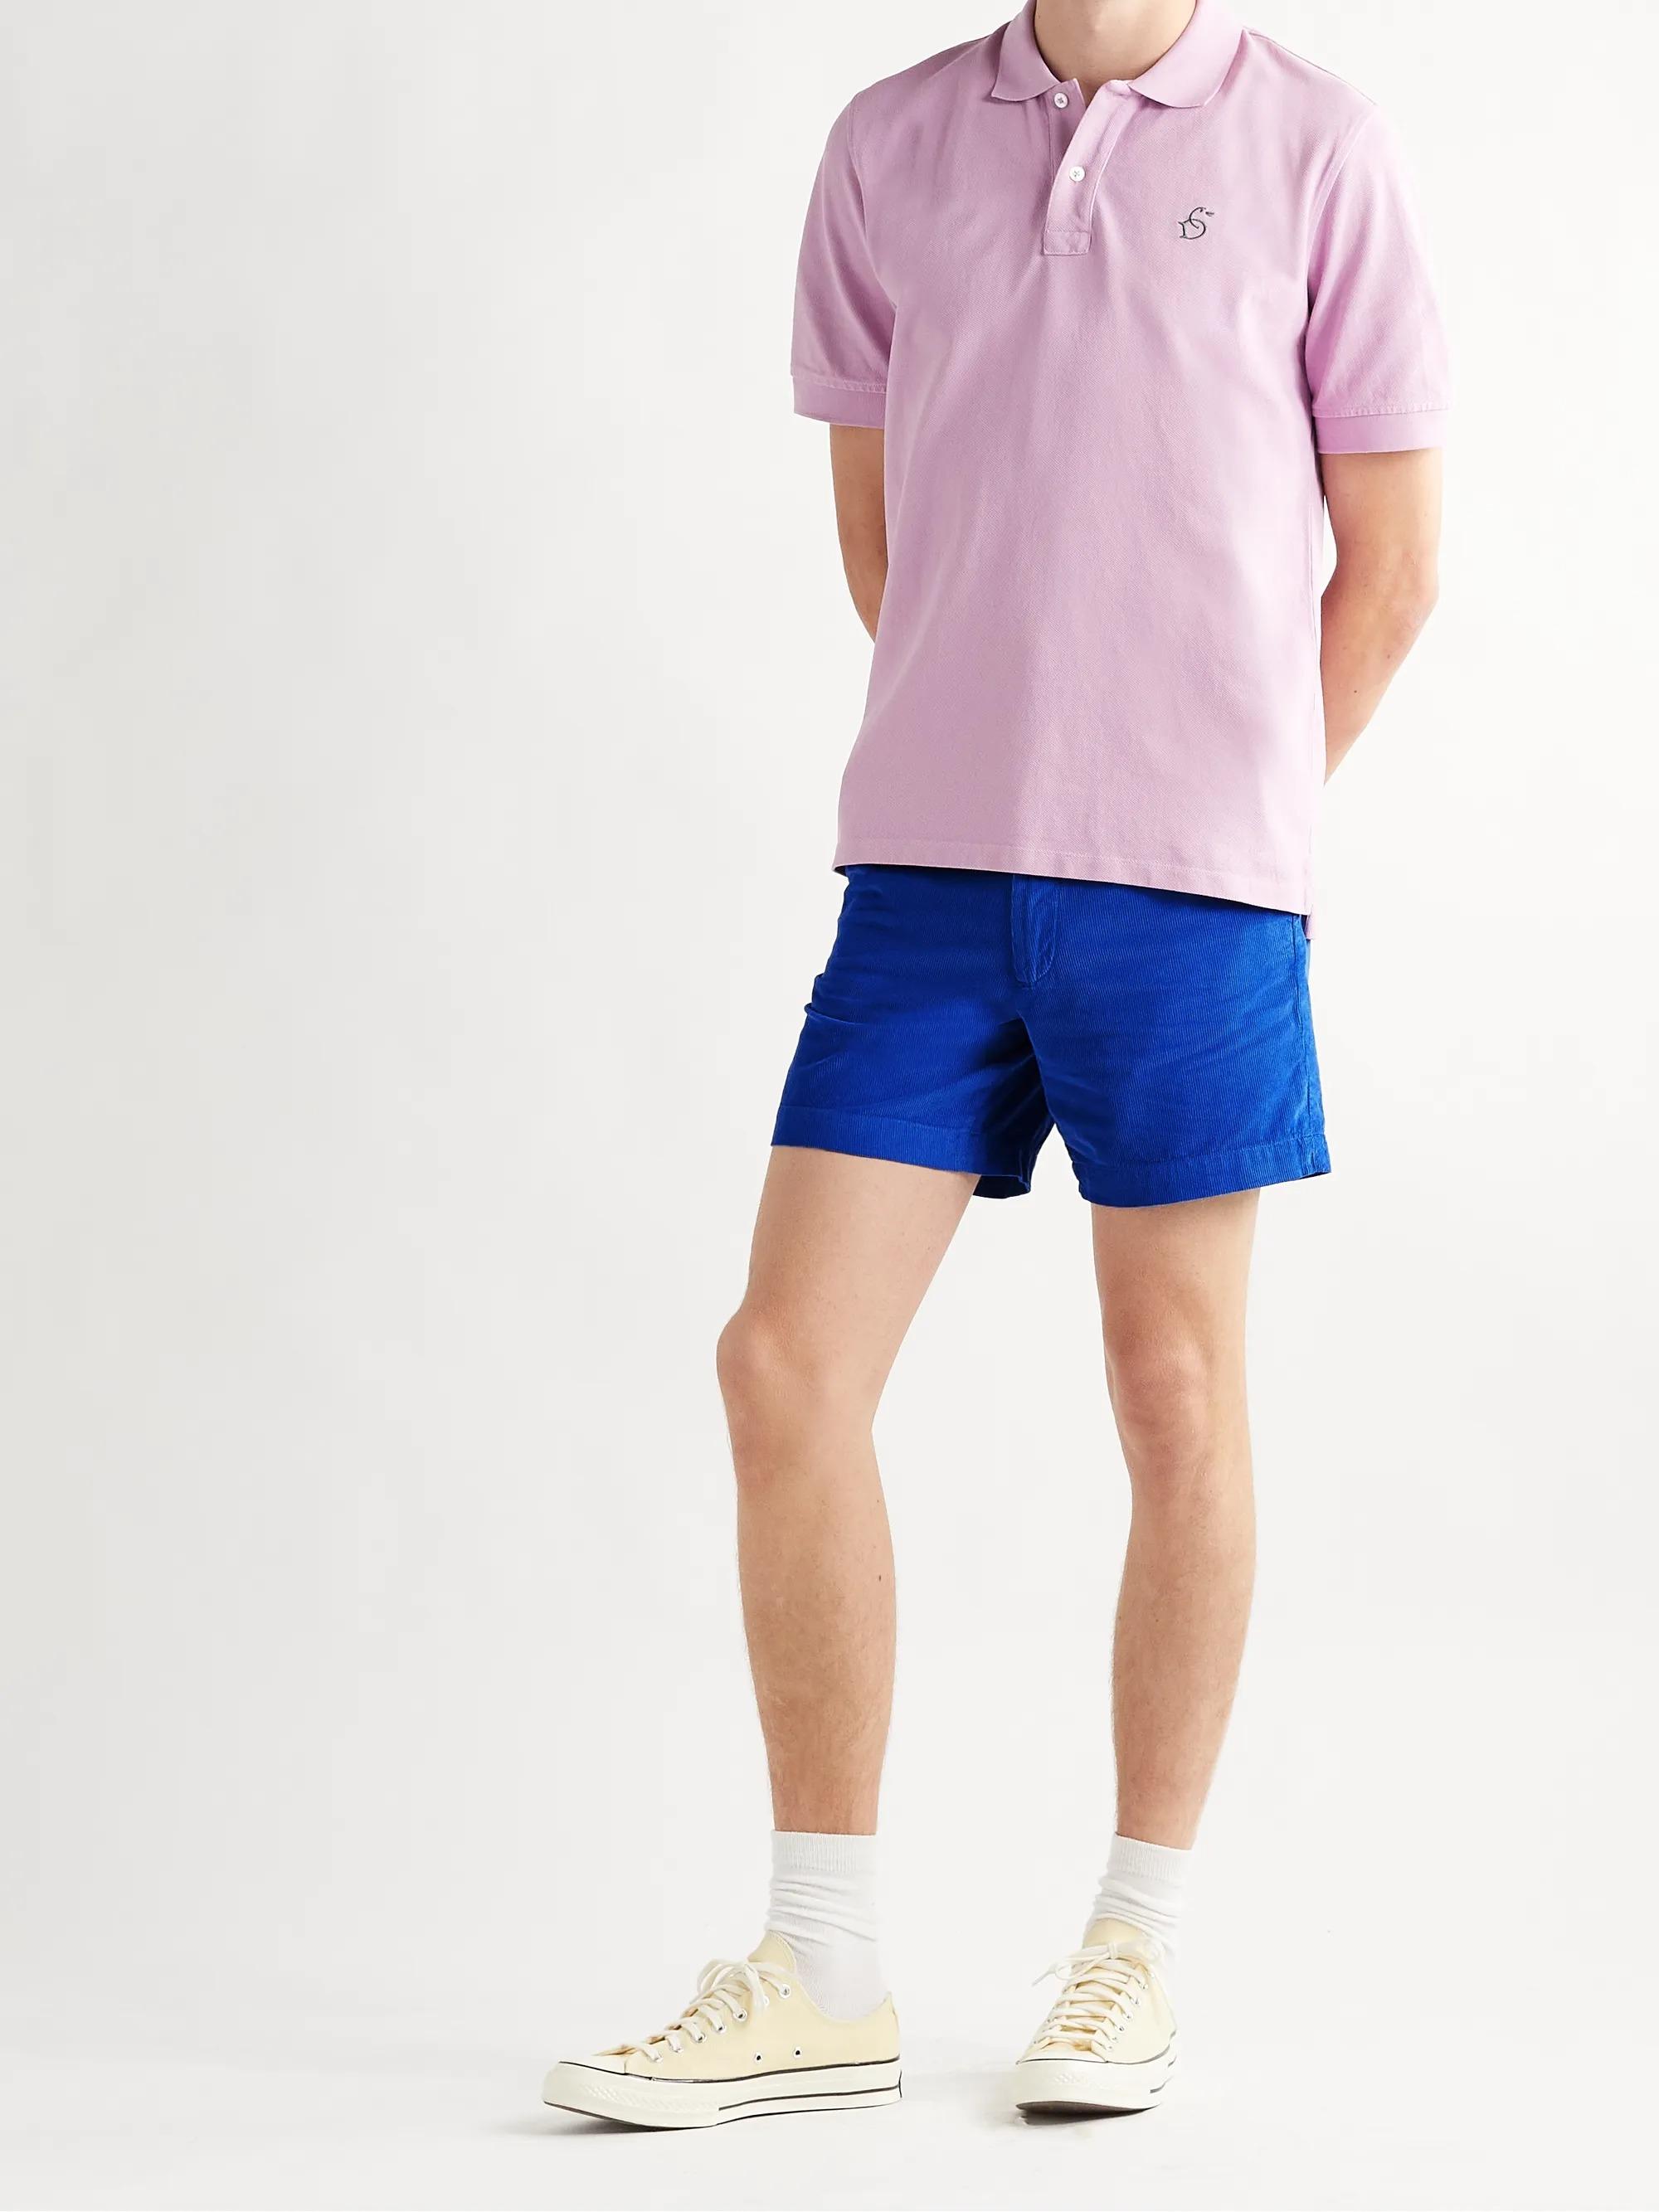 Drakes-Slim-Fit-Corduroy-Cotton-Chino-Shorts